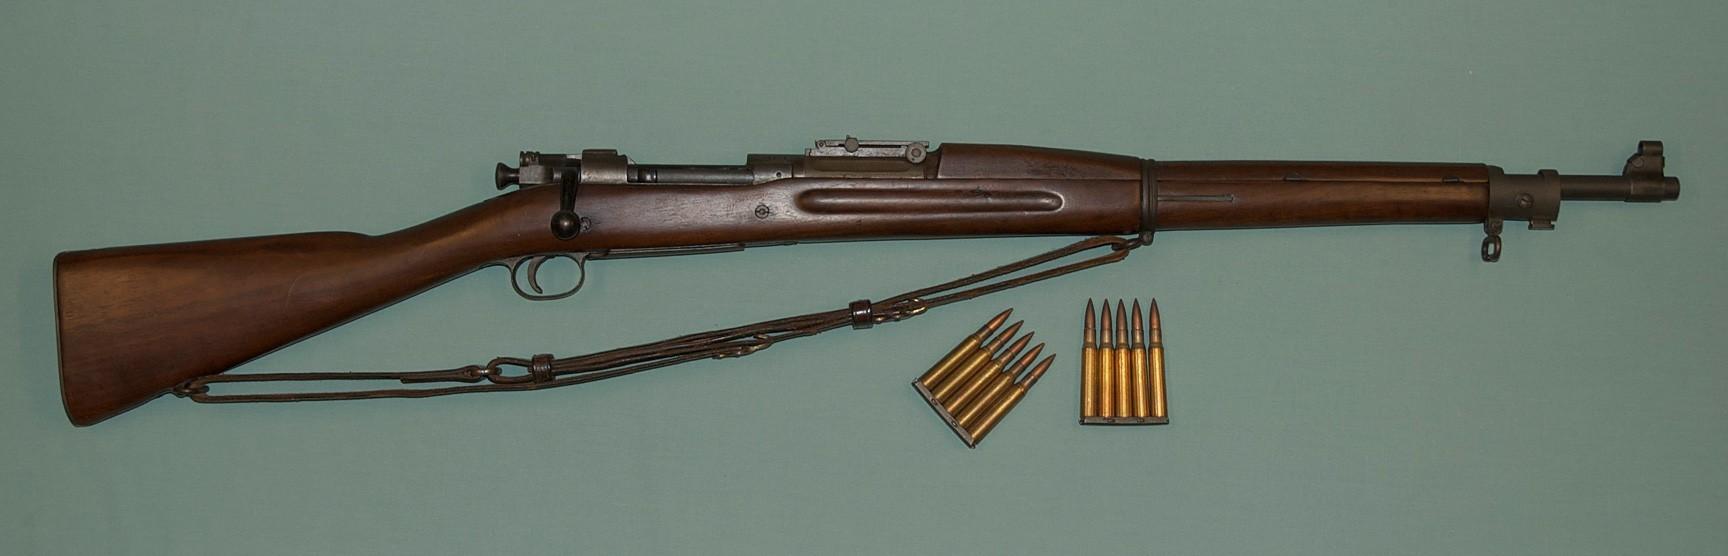 Springfield M1903 с патронами